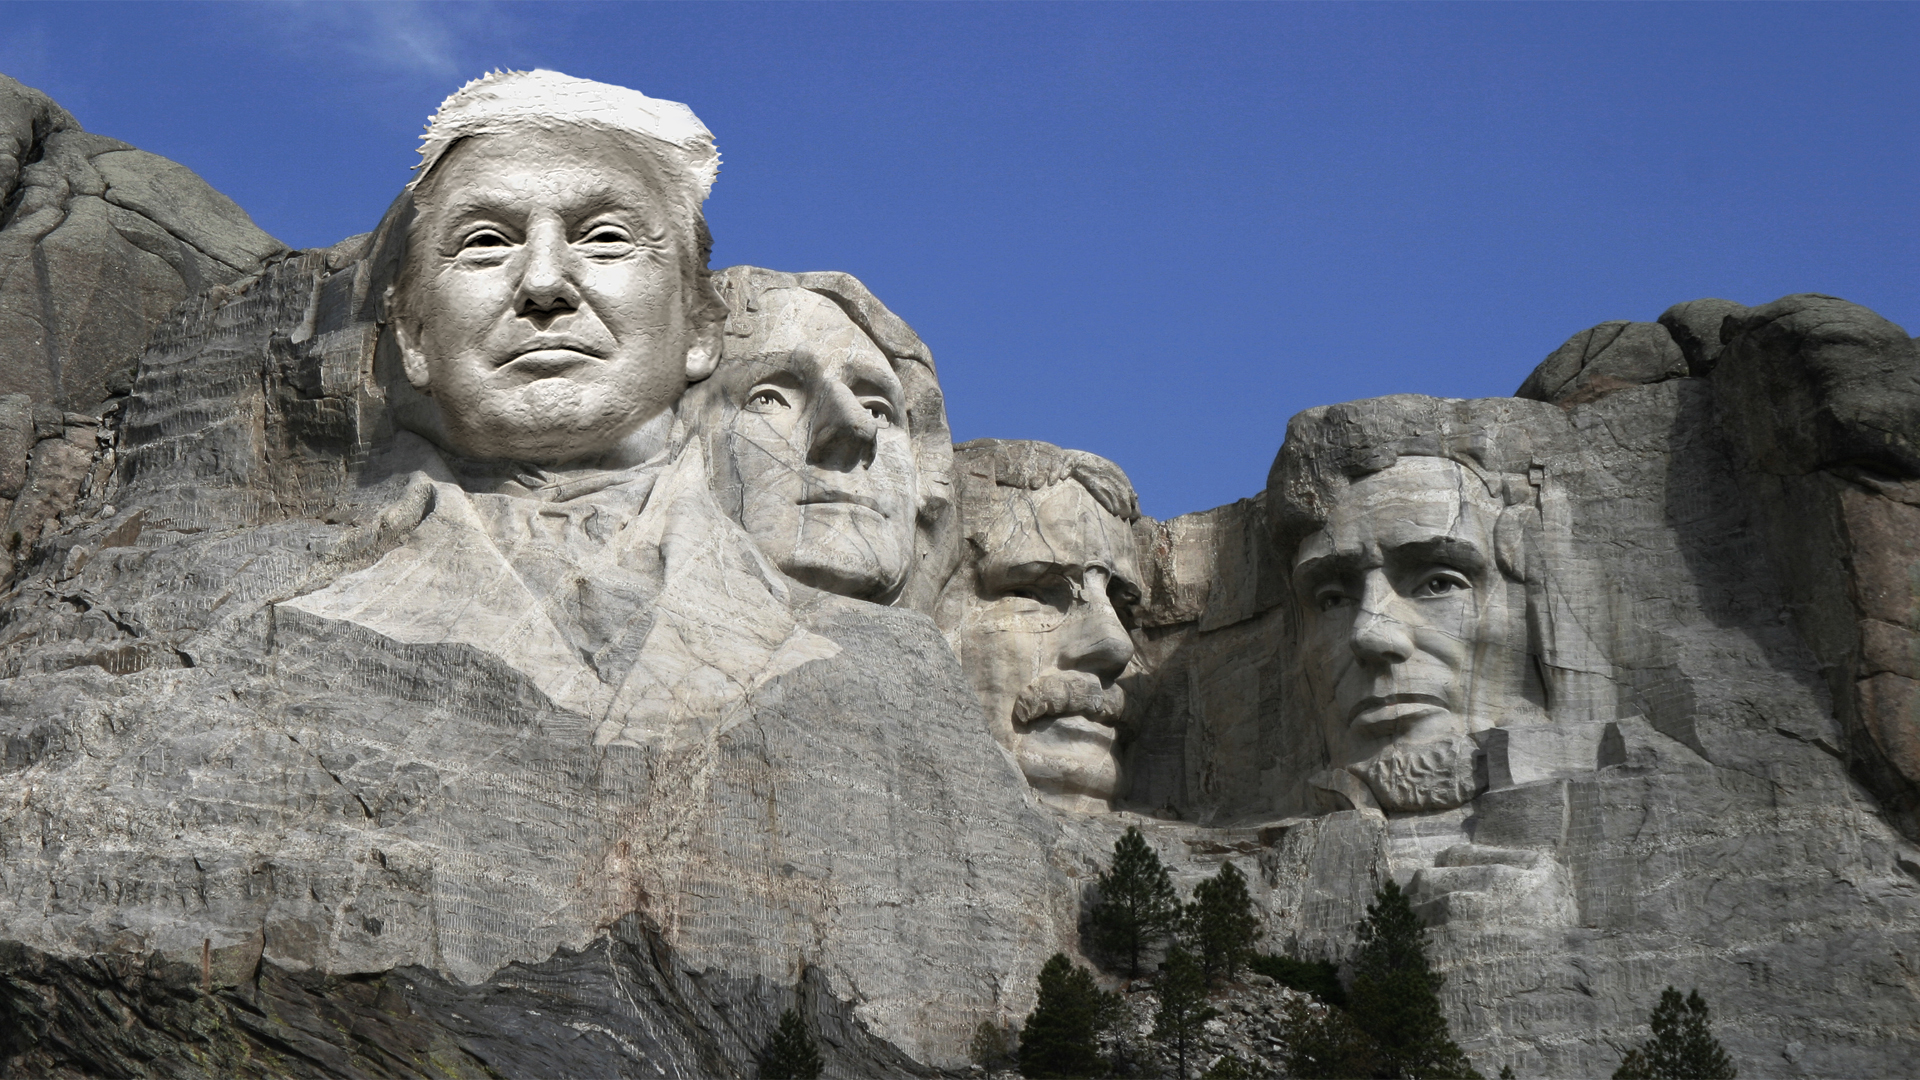 Trump On Mt Rushmore